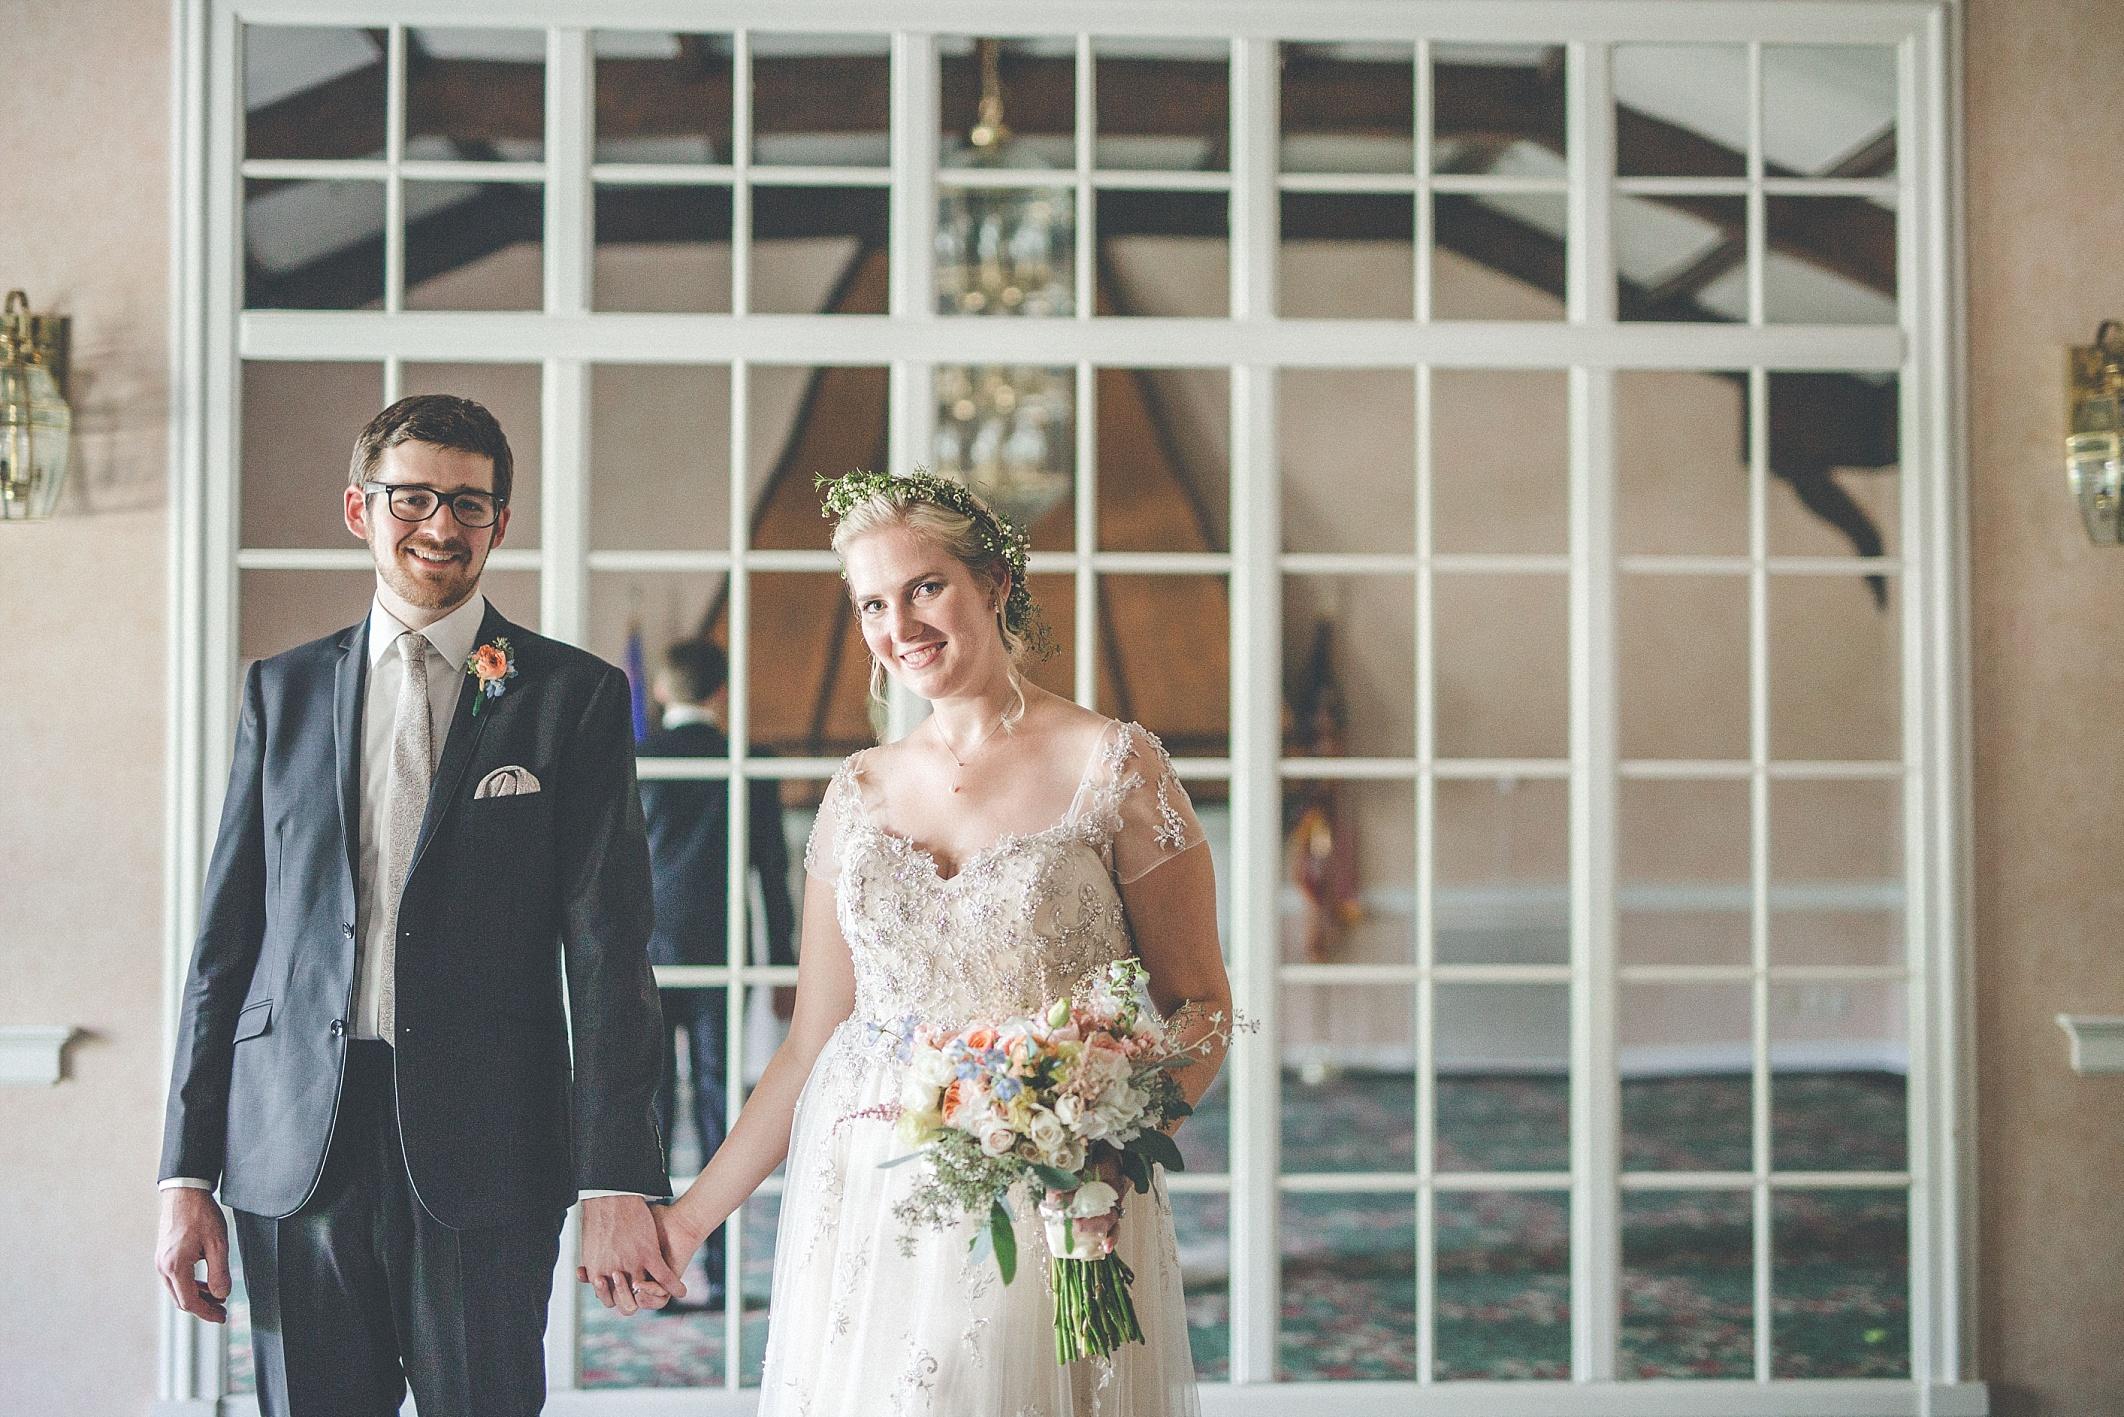 wedding-photographer-dayton-ohio_0100.jpg